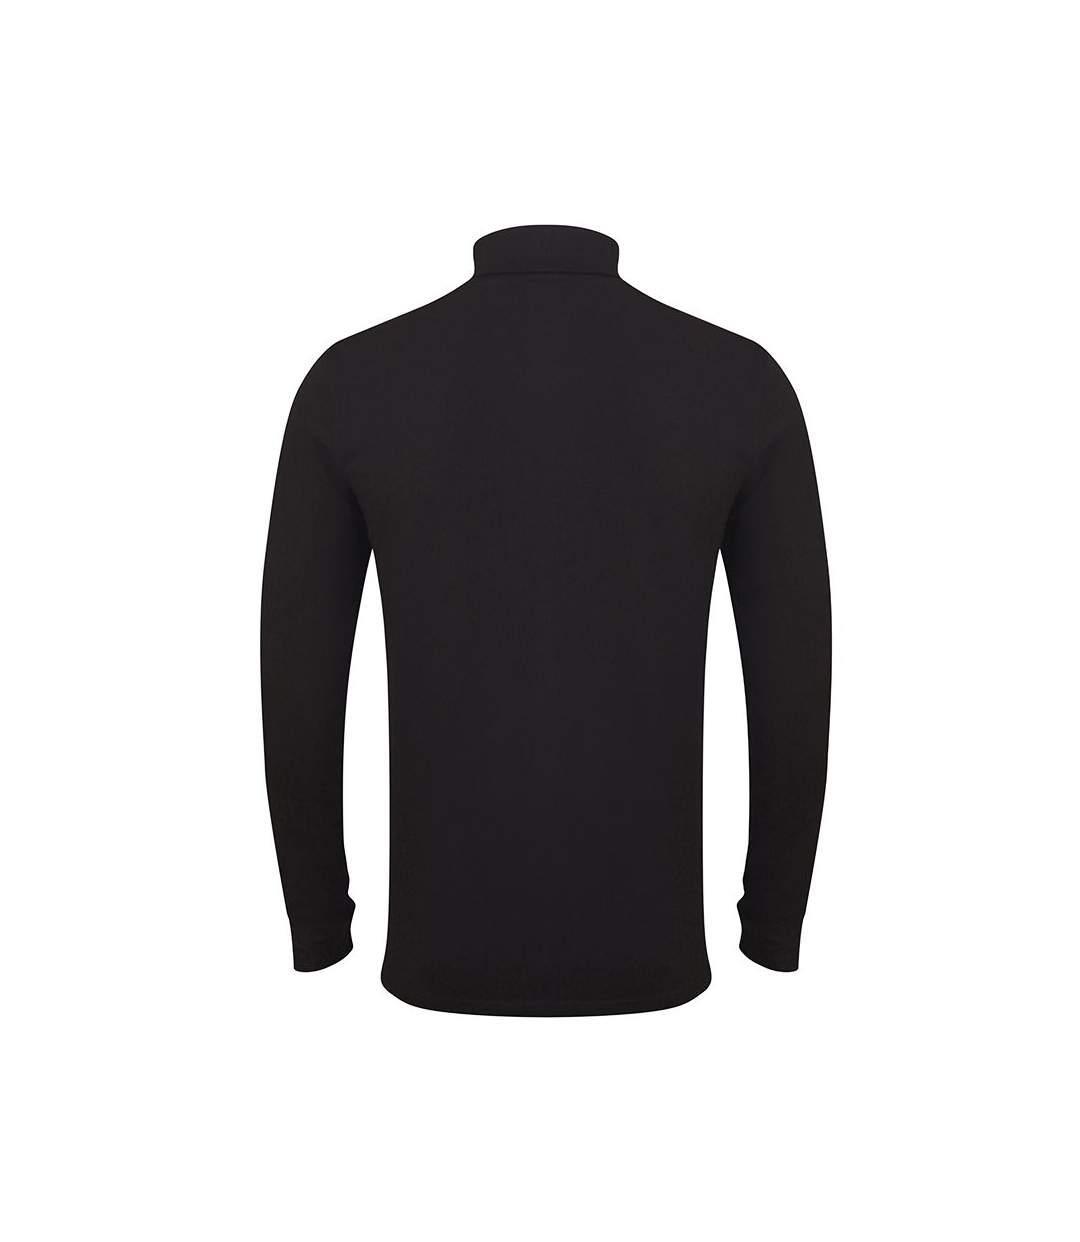 Skinni Fit Mens Feel Good Roll Neck Long Sleeve Top (Black) - UTRW5500